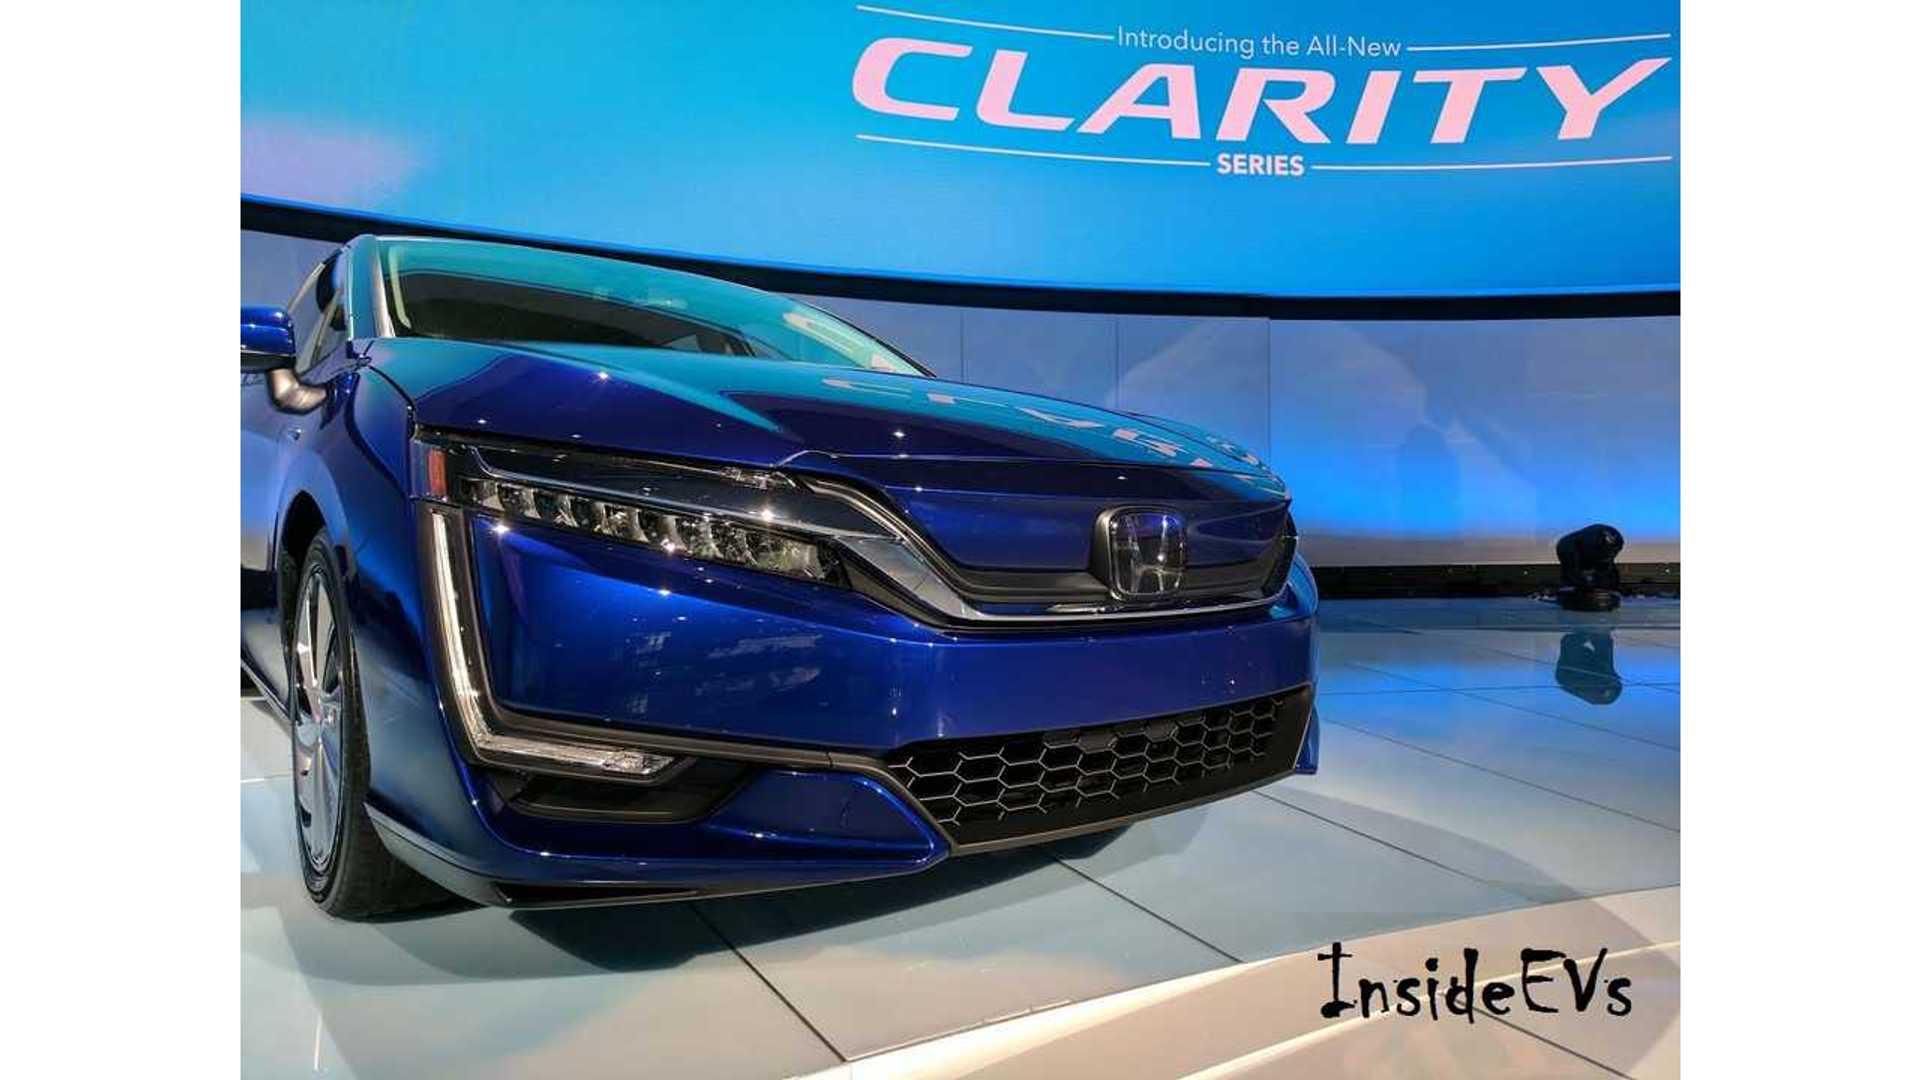 Honda Clarity Electric Epa Range Ratings In Detail Less Than 80 Miles Highway